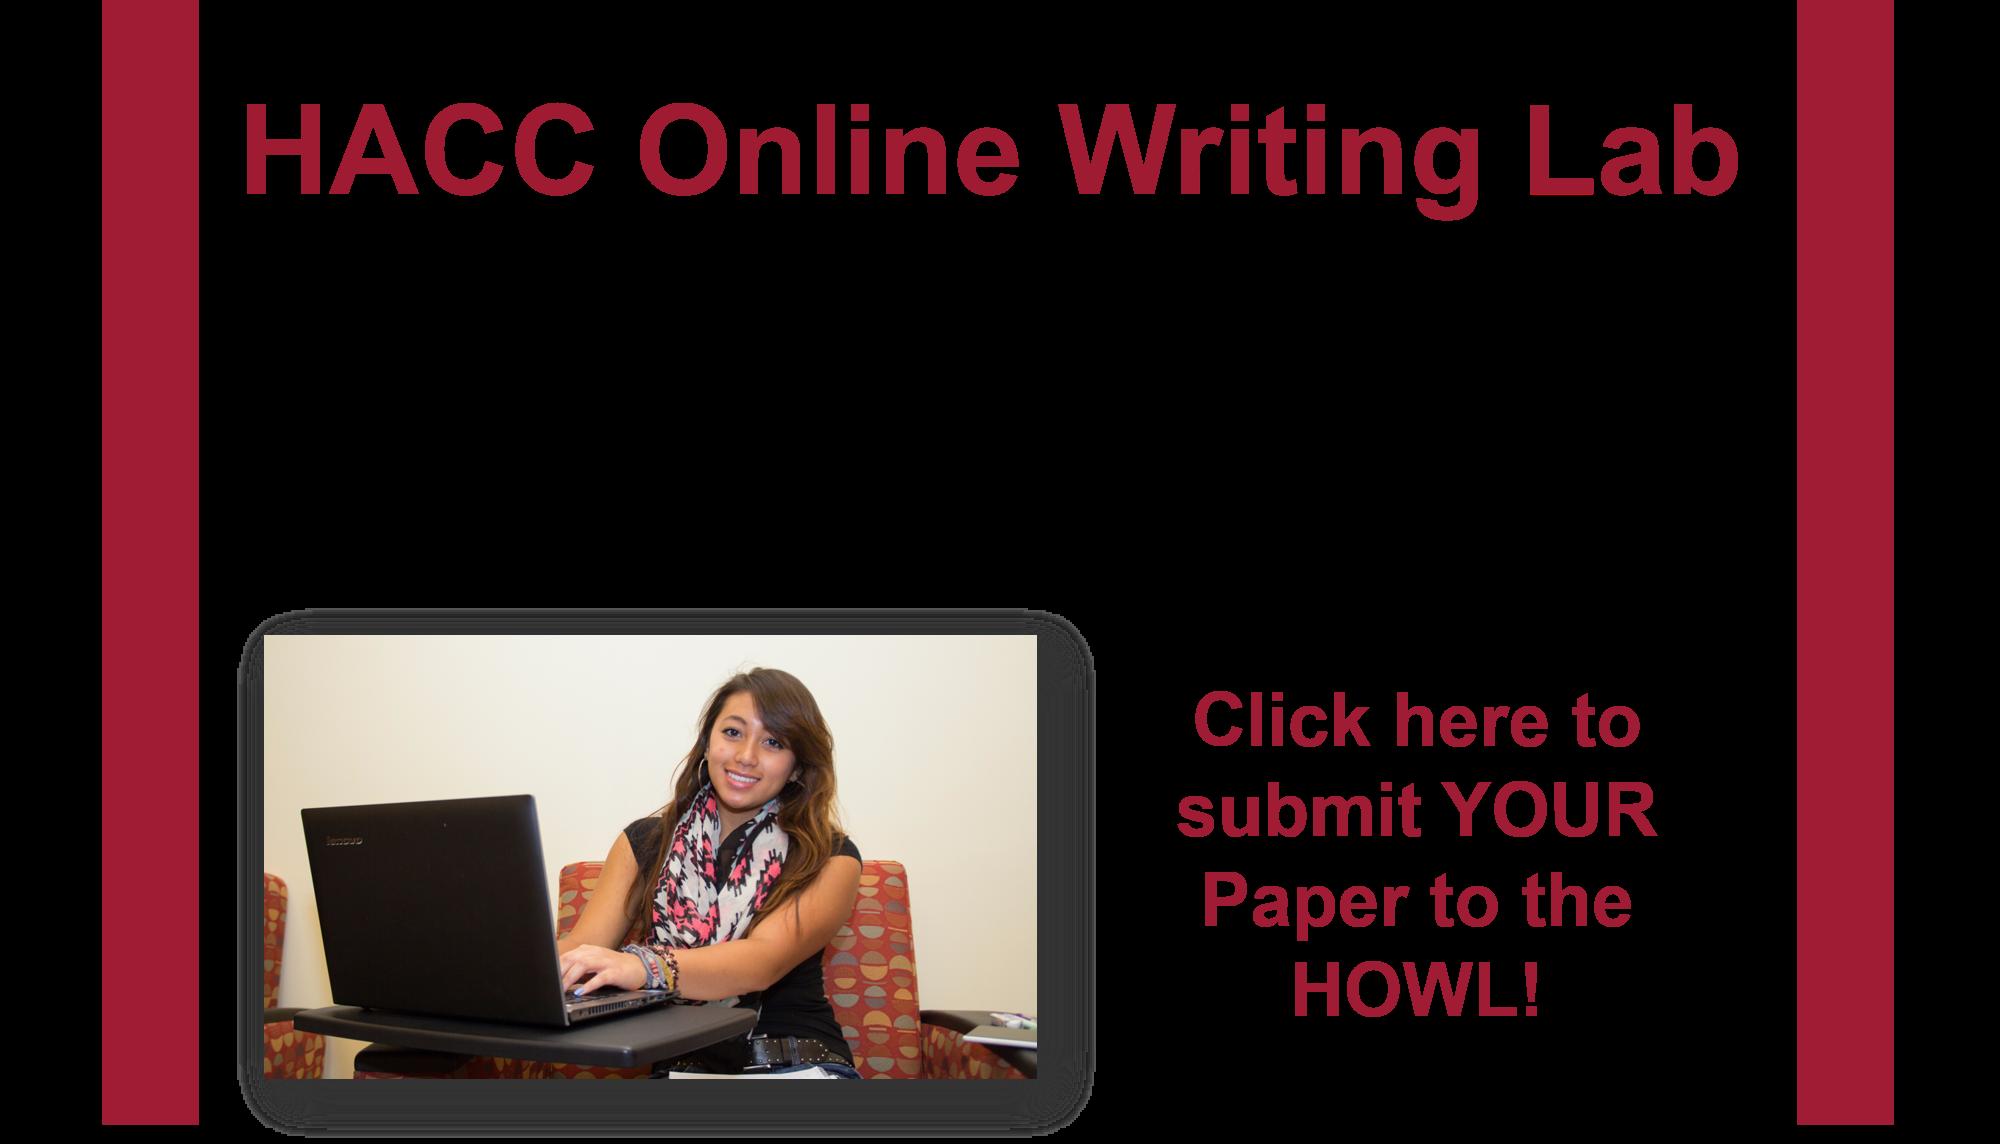 HACC Online Writing Lab